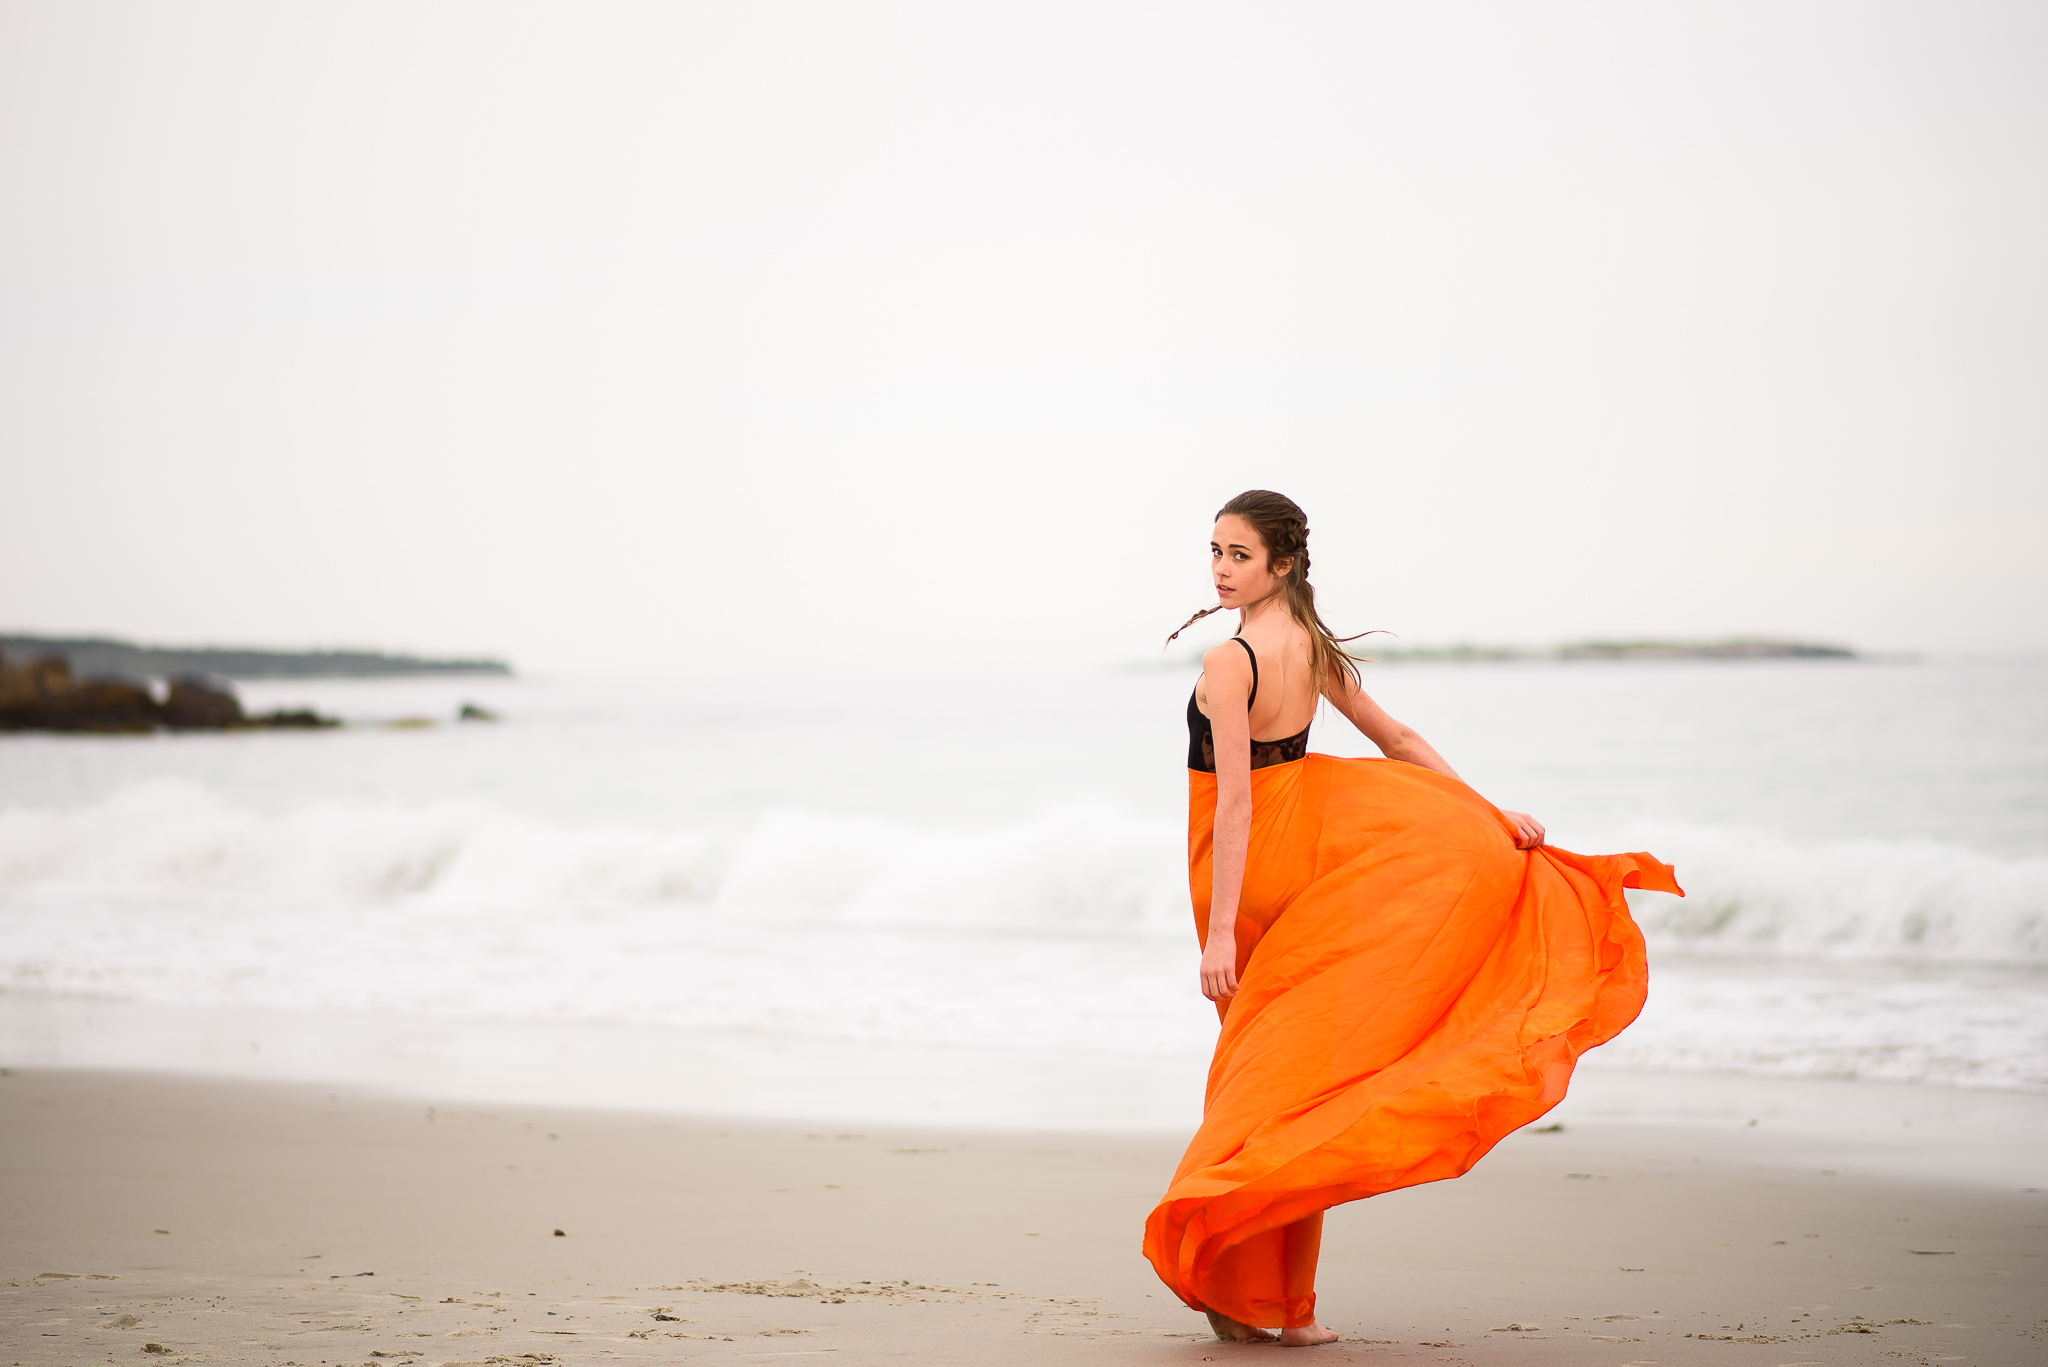 Photography: Stephanie Lane l Model: Katie McDonald l Hair: Julia Everhair l Surface Designer: Dee Wilkie